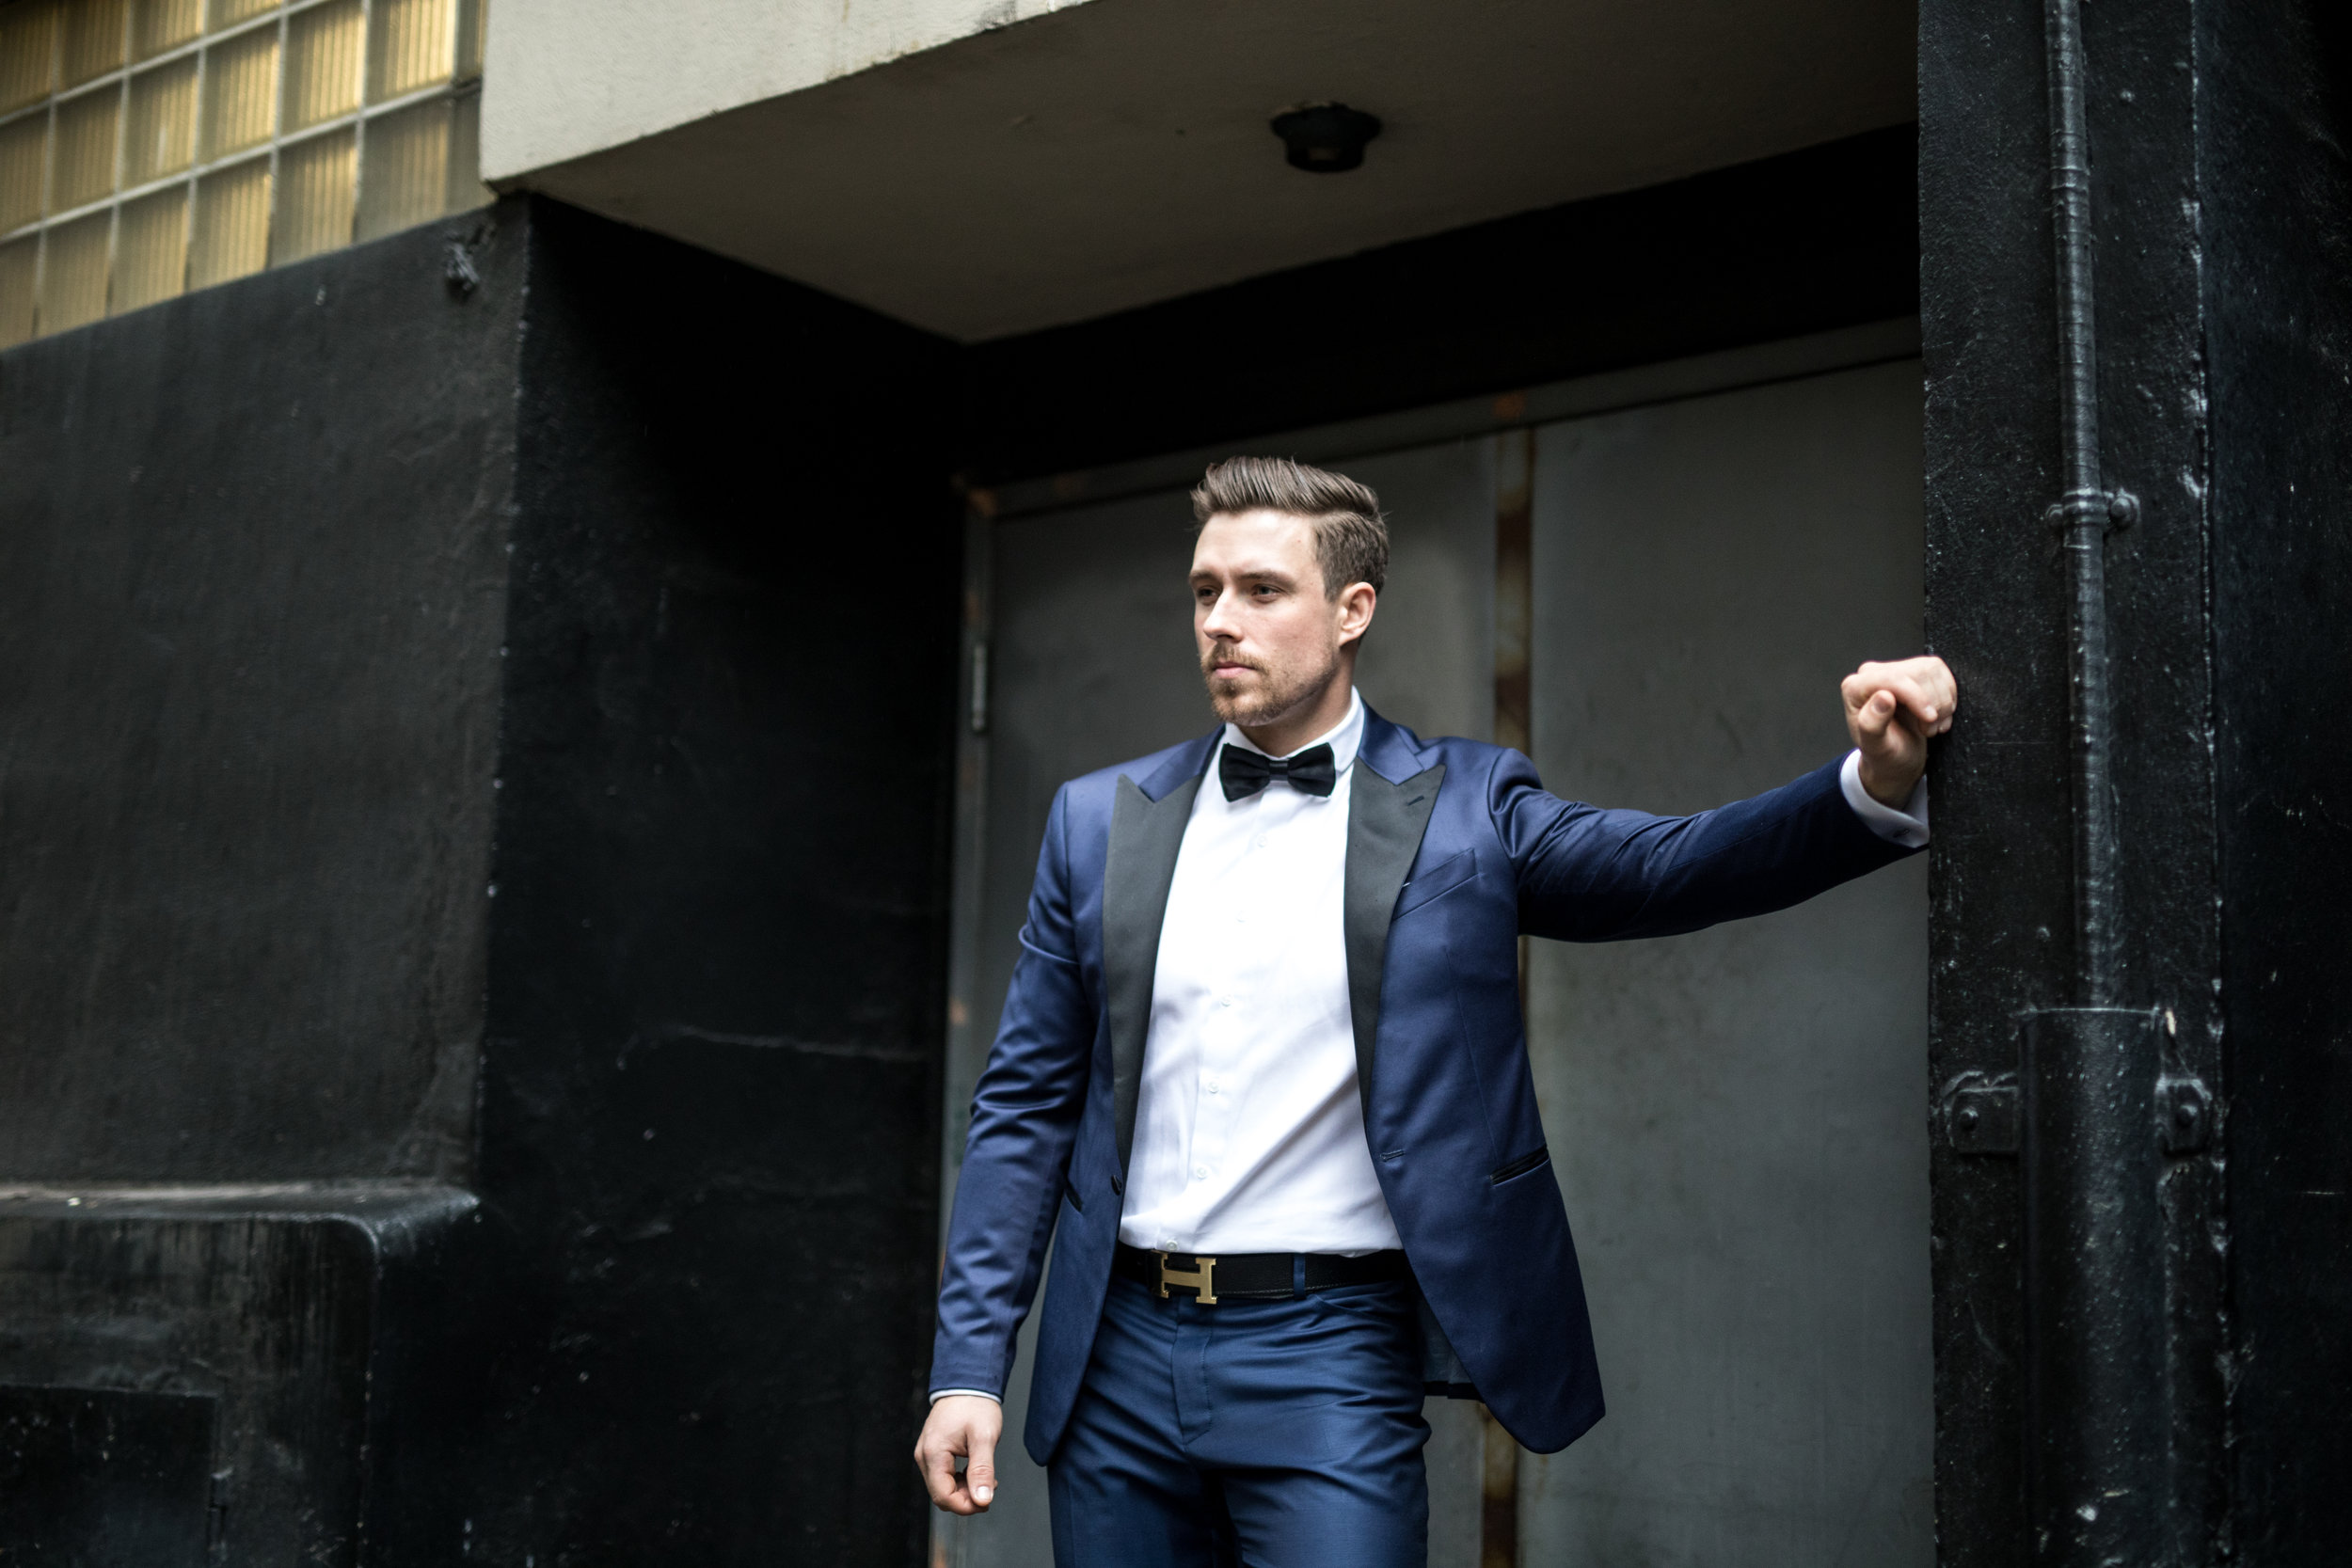 Bespoke-suits-navy-tuxedo.jpg